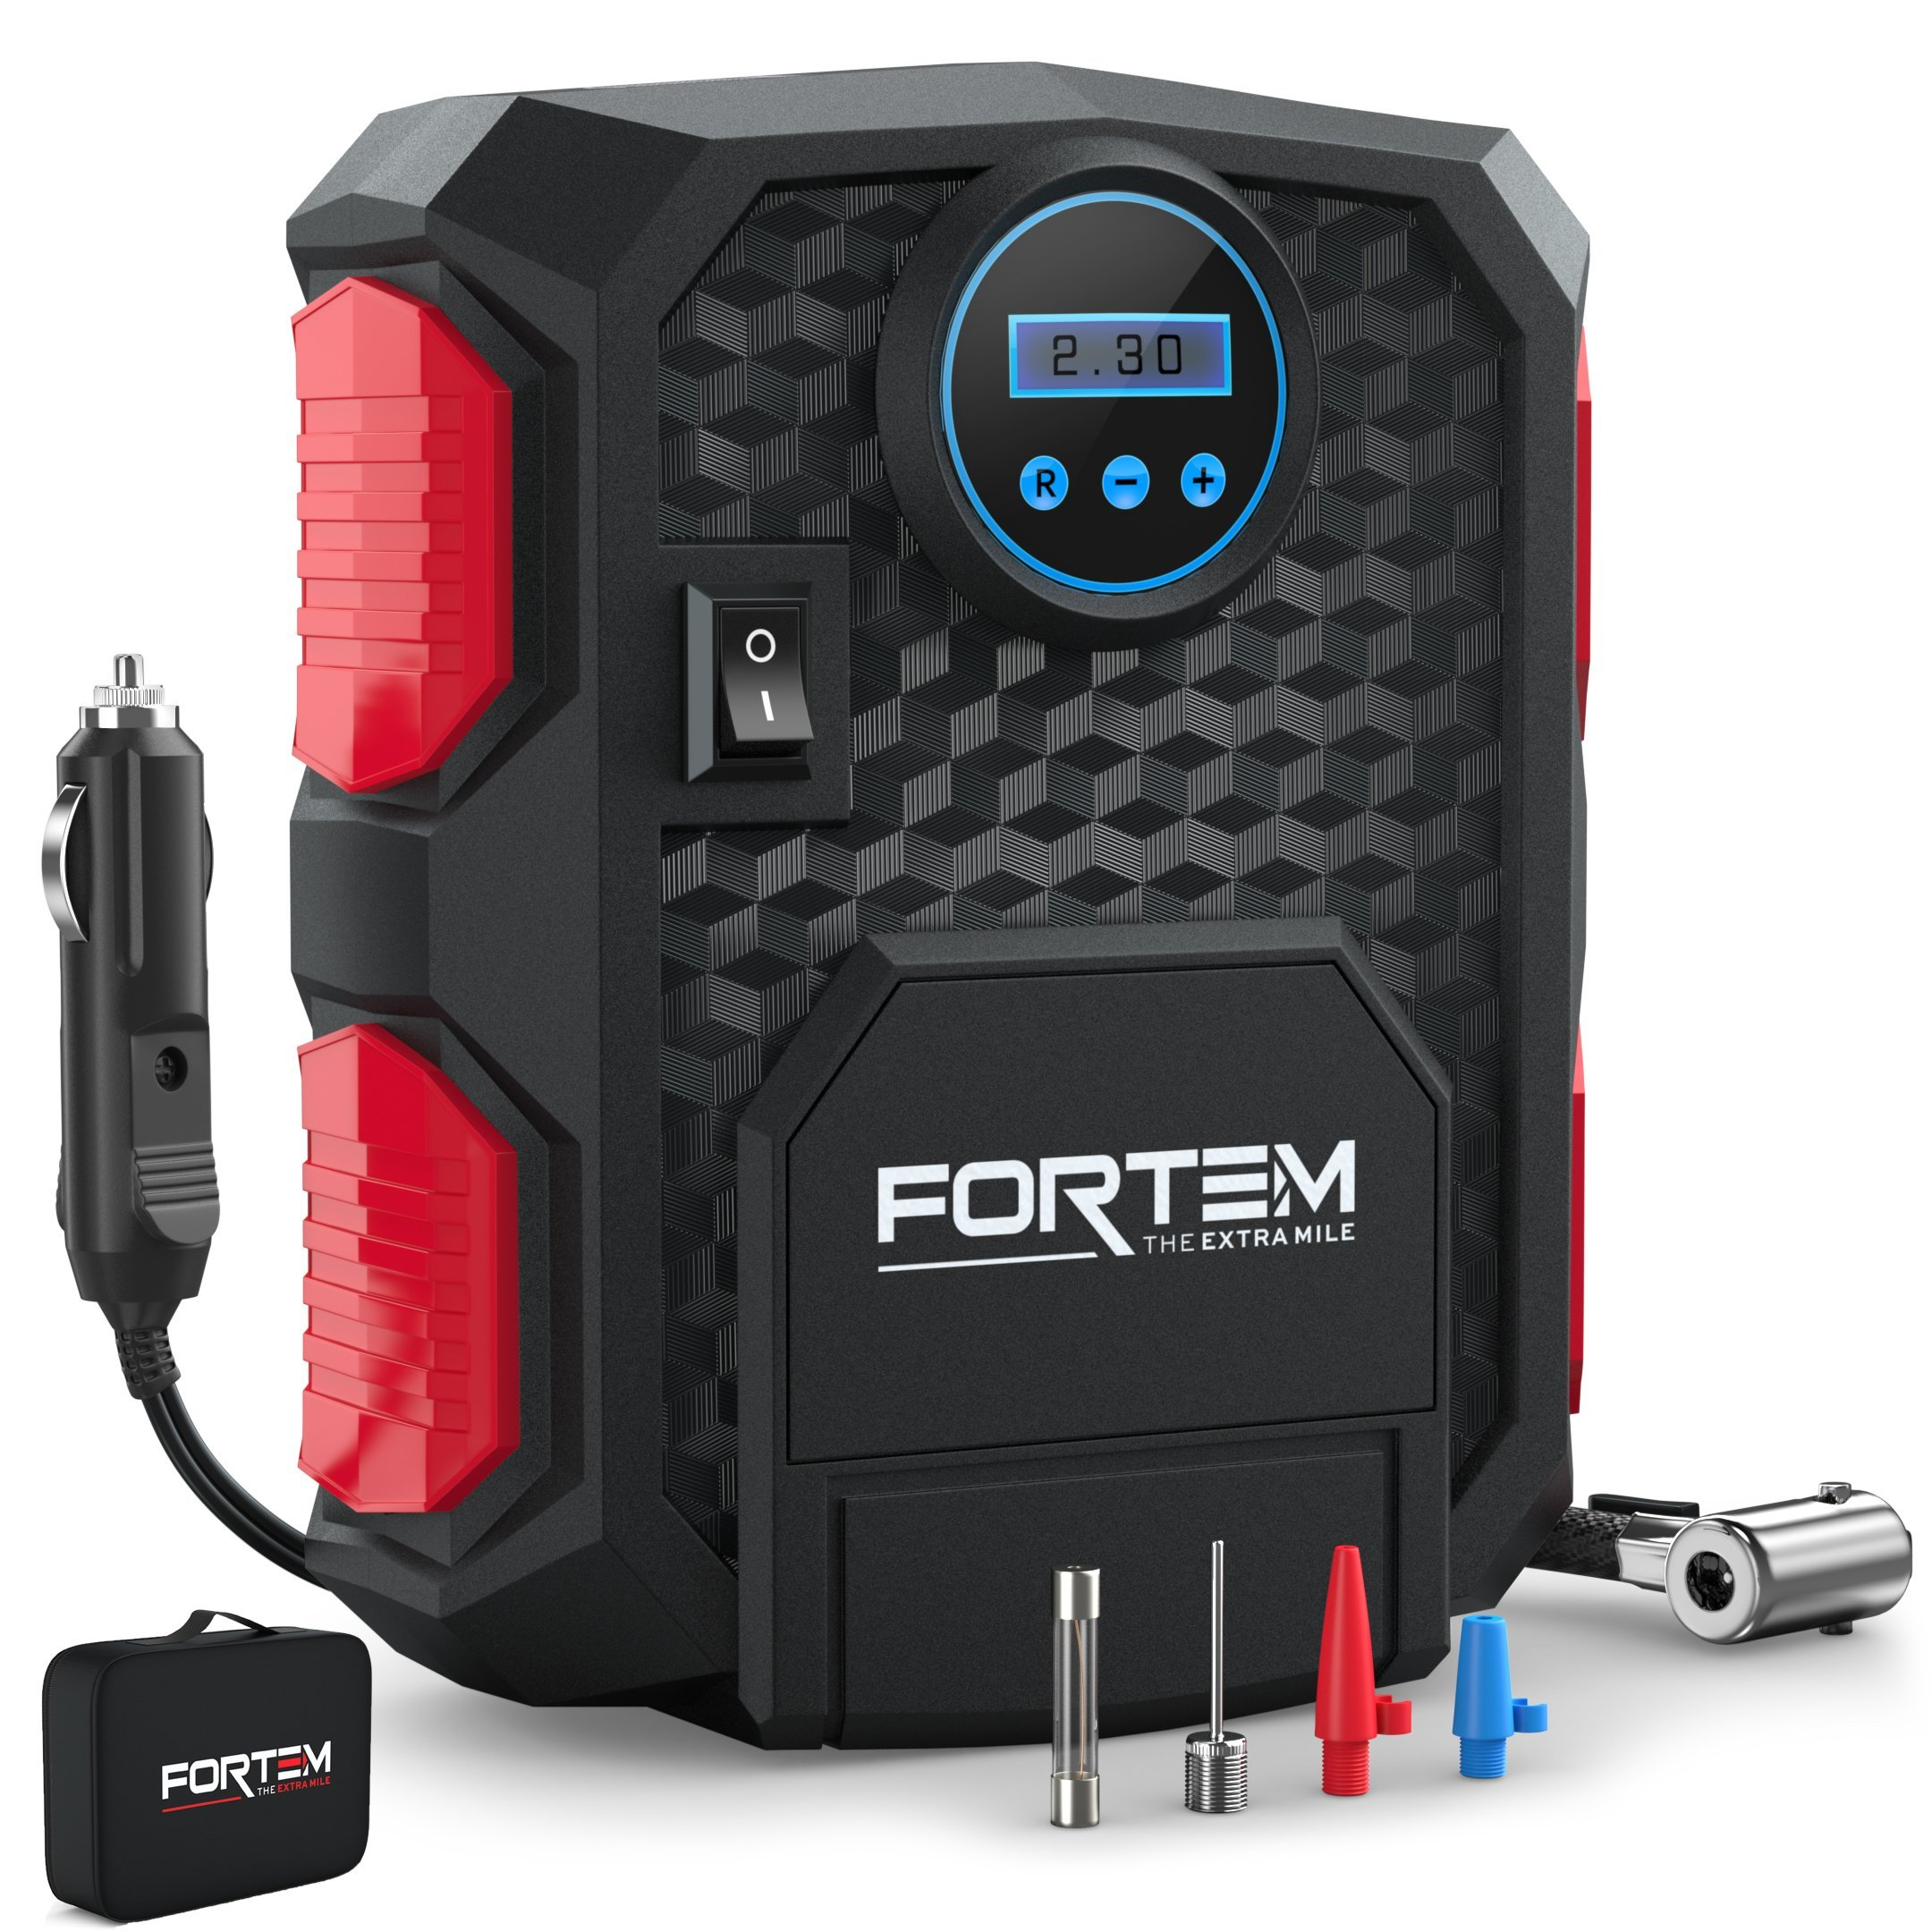 Digital Tire Inflator for Car W/Pressure Gauge Portable